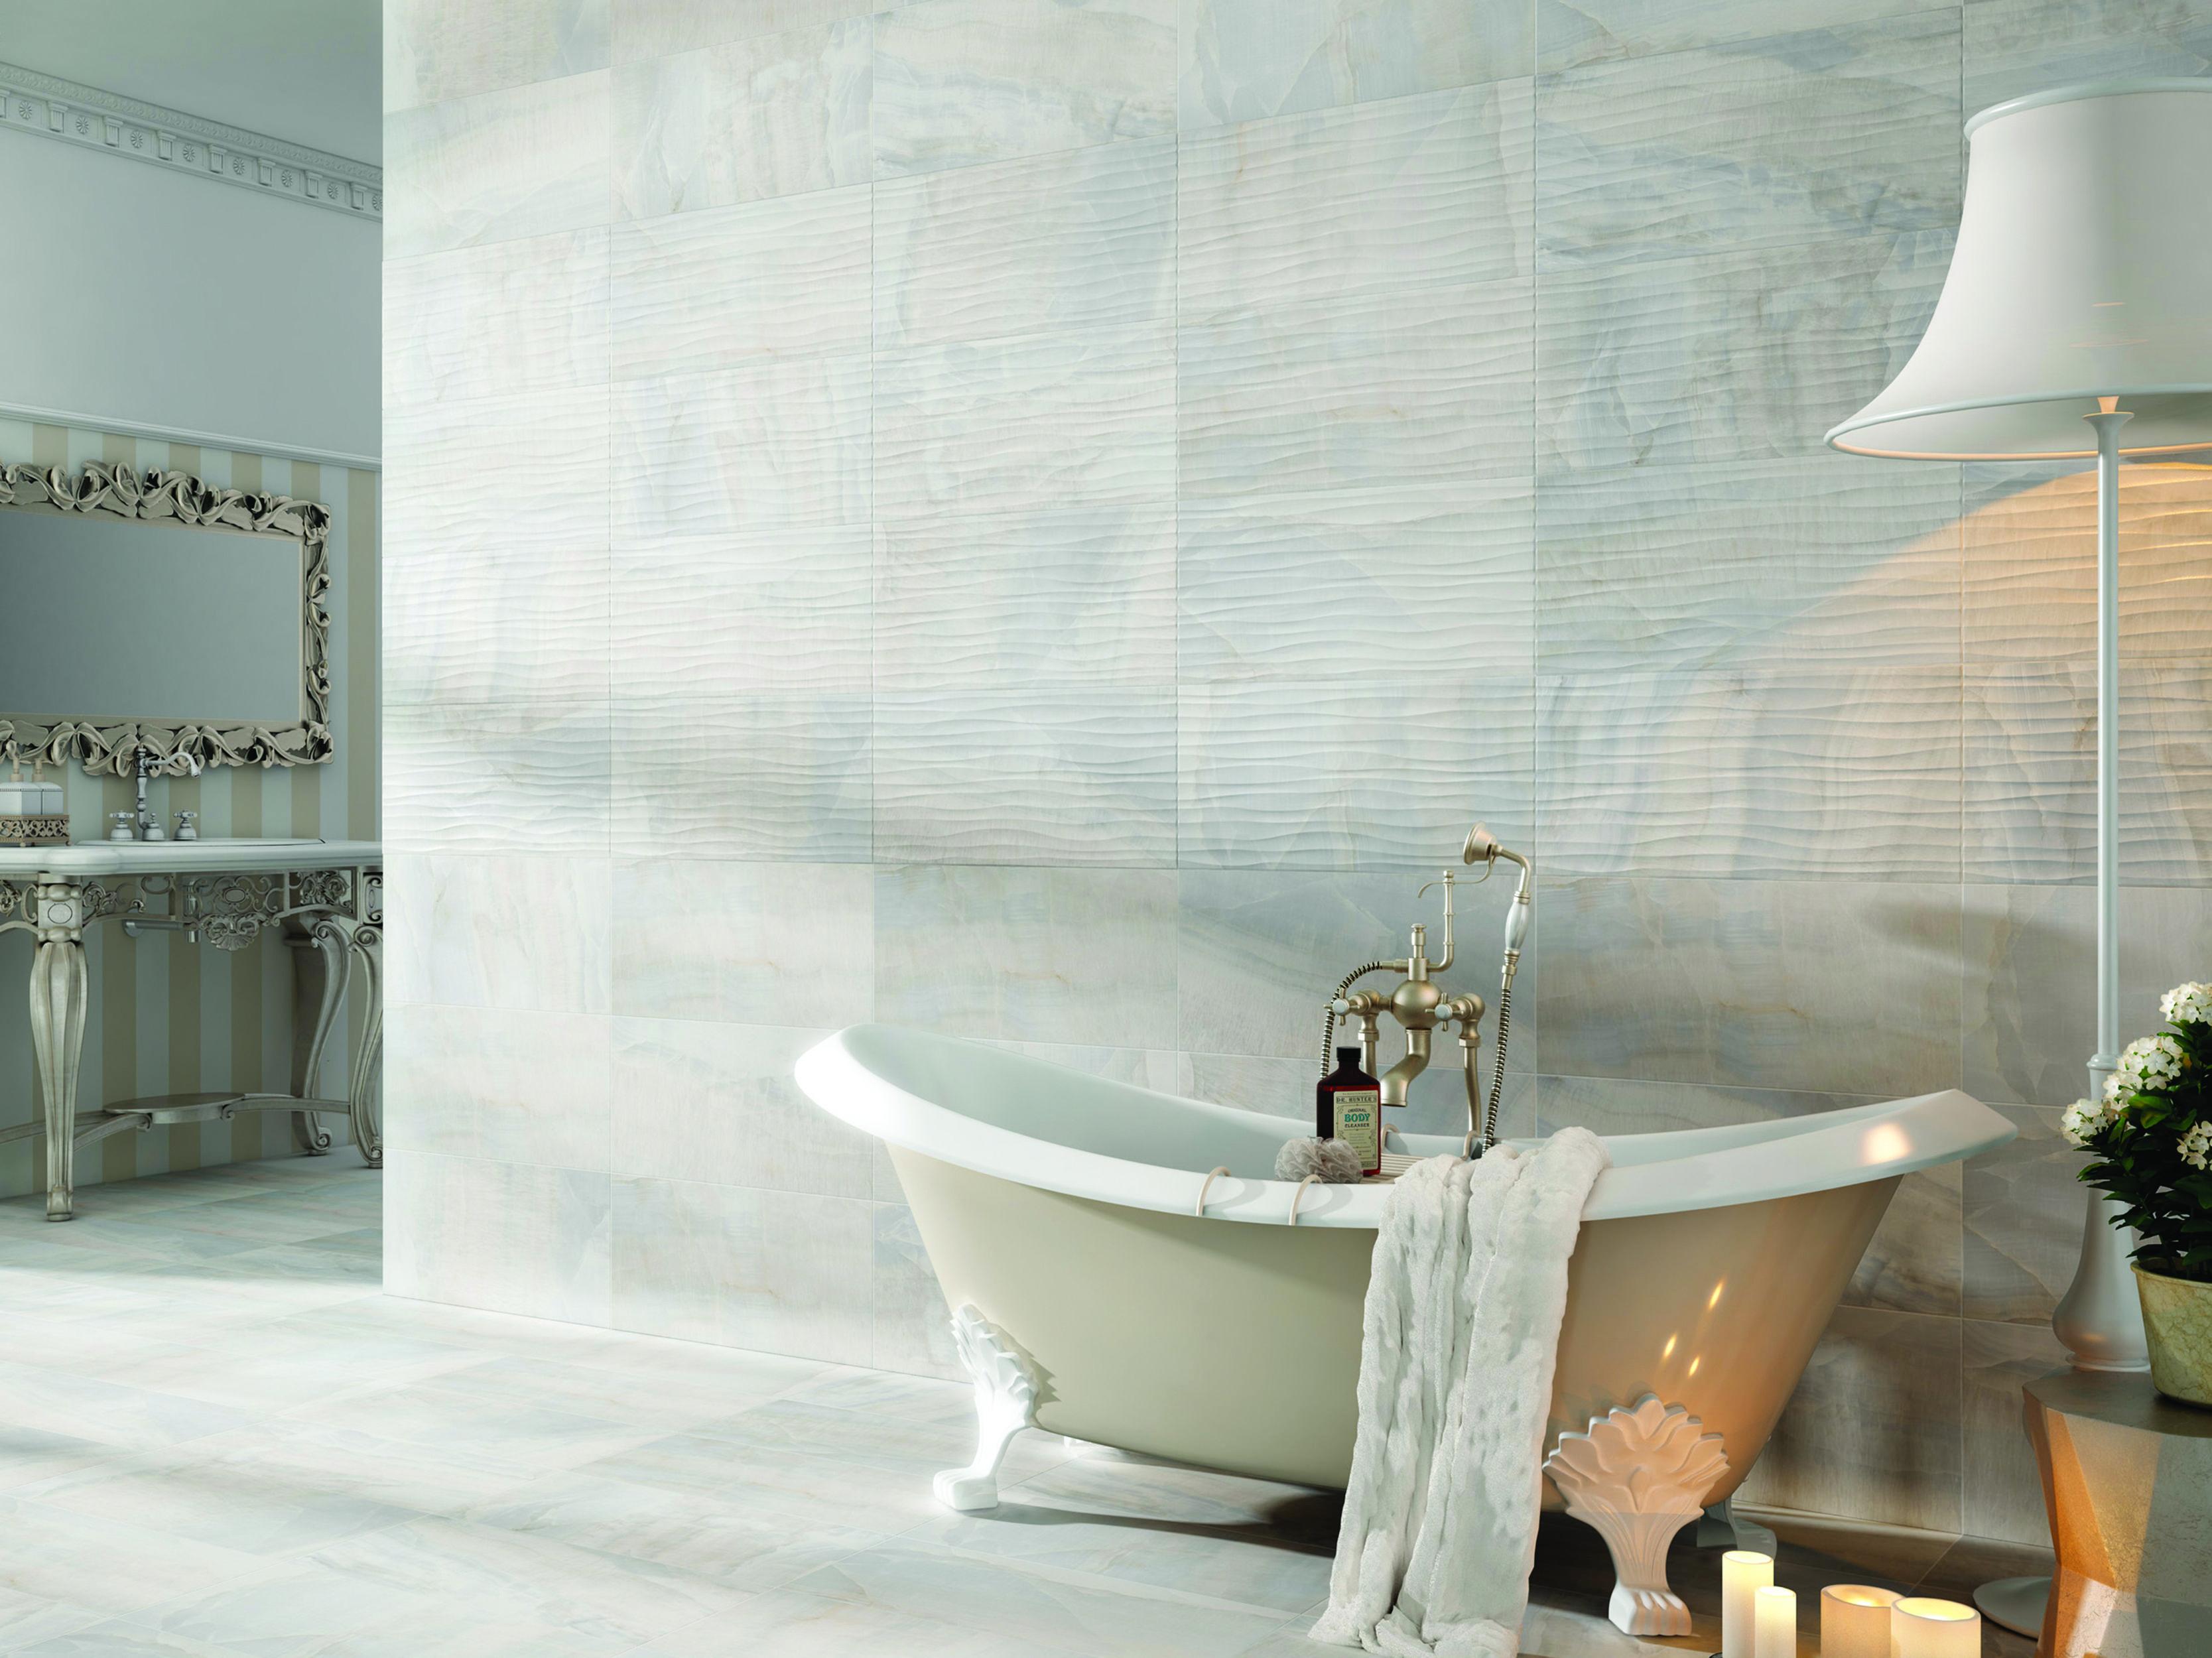 Tilemax Dubai Blanco Plain + Deco   Gray bathroom decor ...